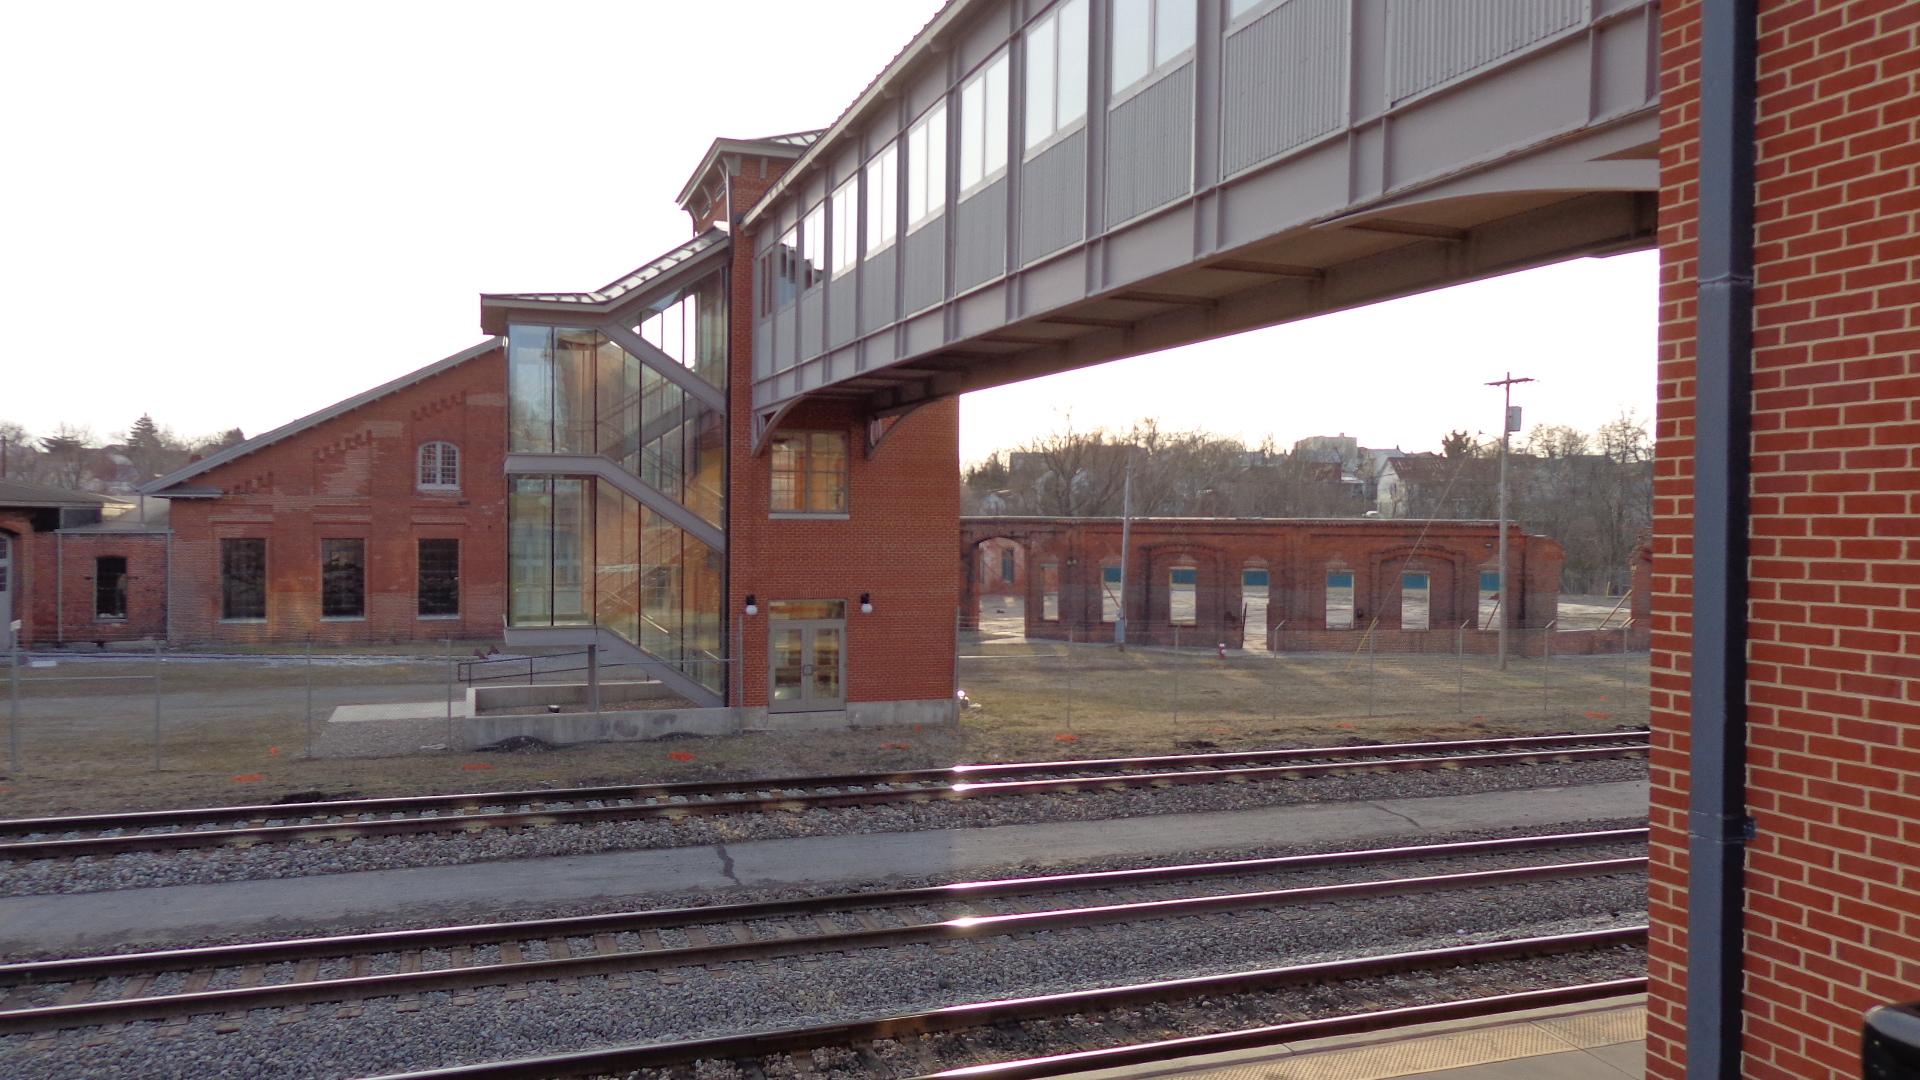 Caperton Train Station & Bridge to Roundhouse